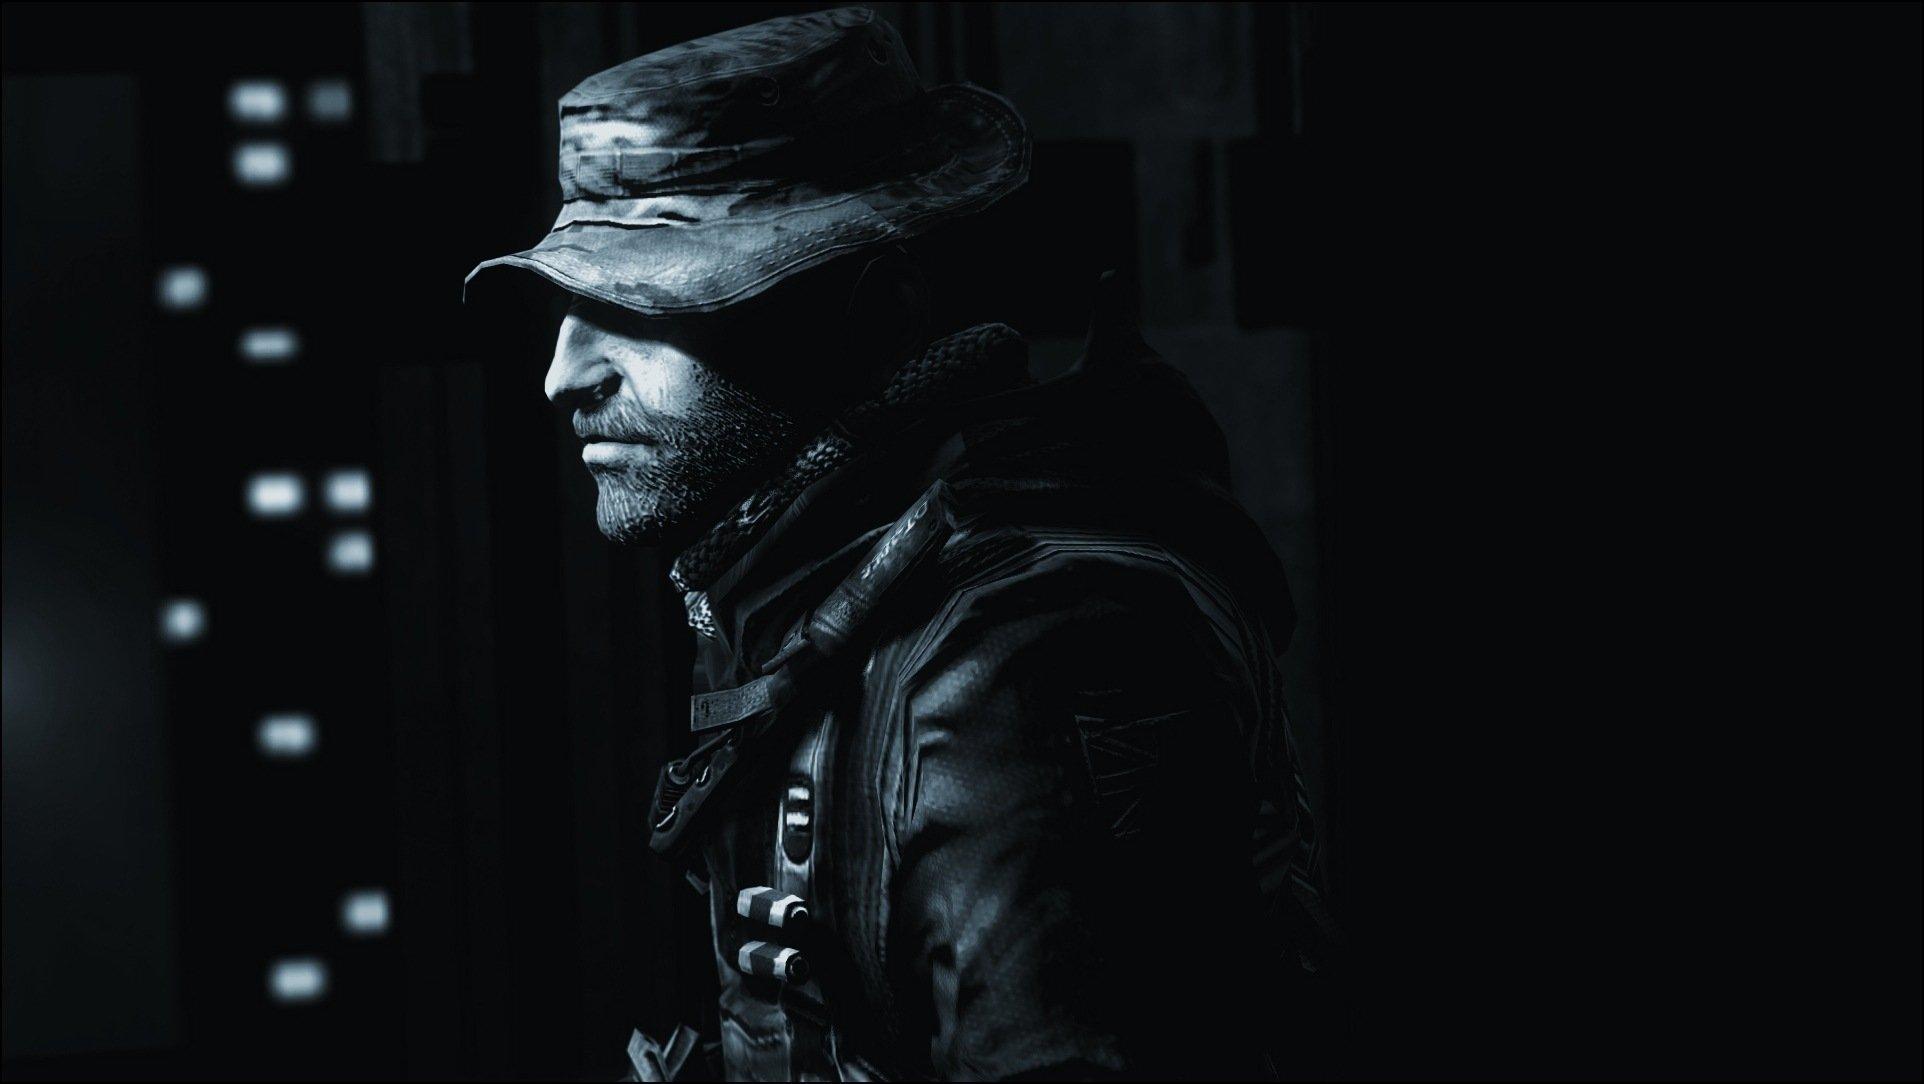 call of duty modern warfare captain john price sas cod mw HD wallpaper 1924x1084